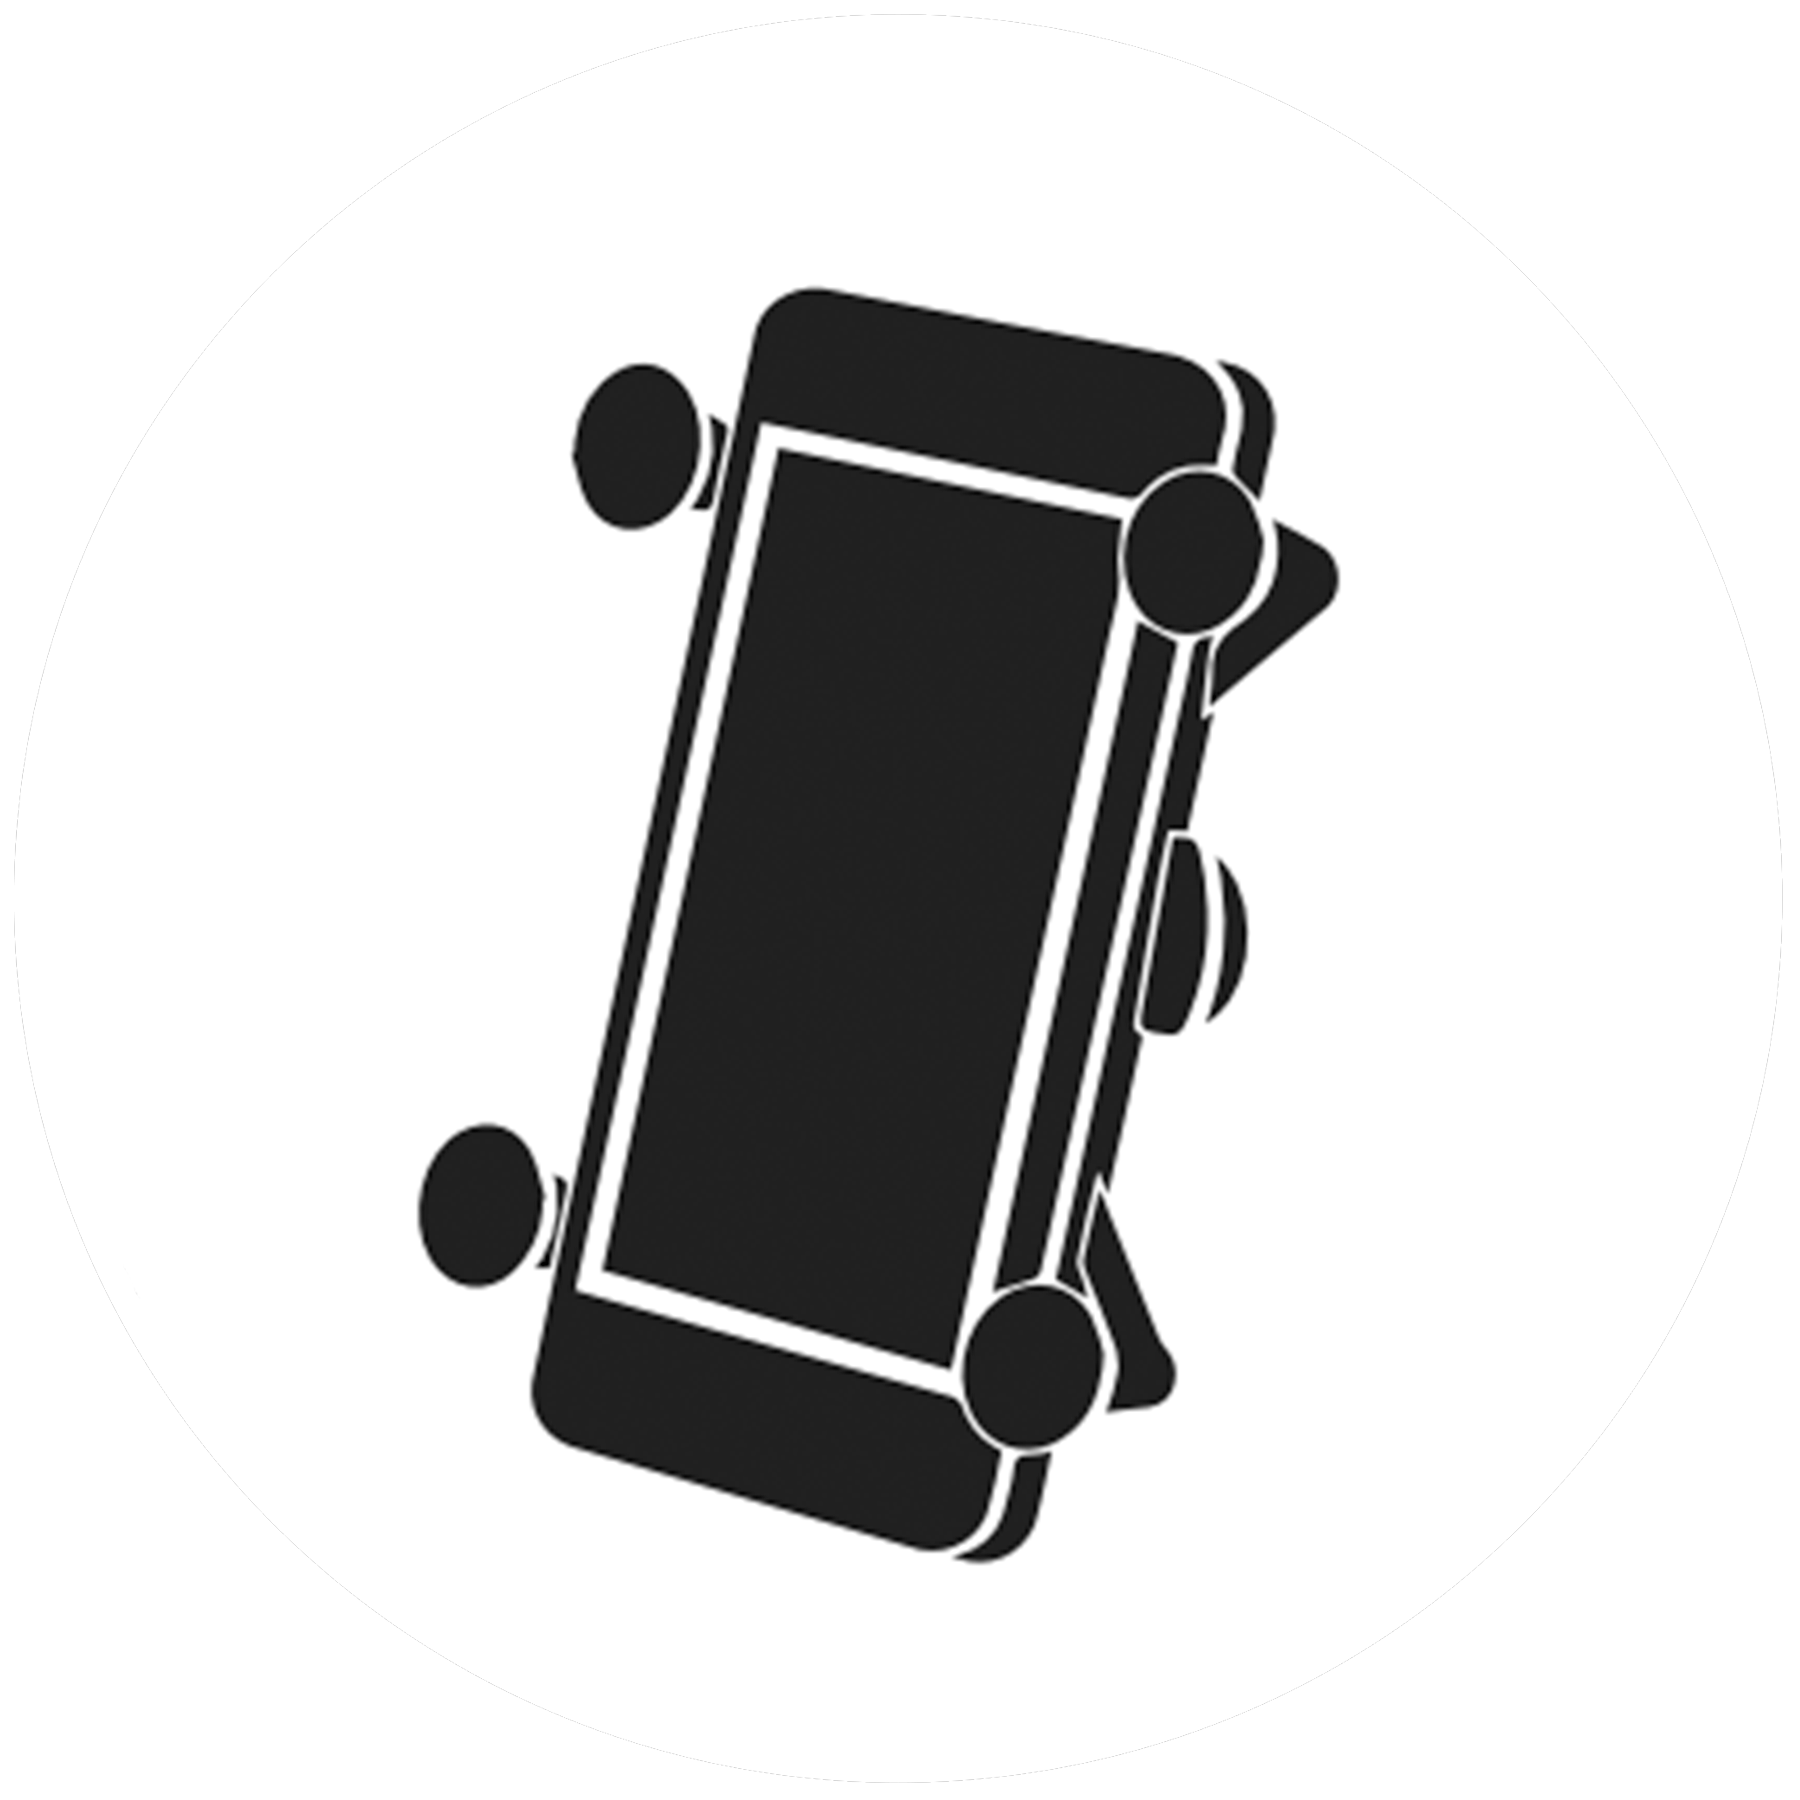 X Grip Phone Holder